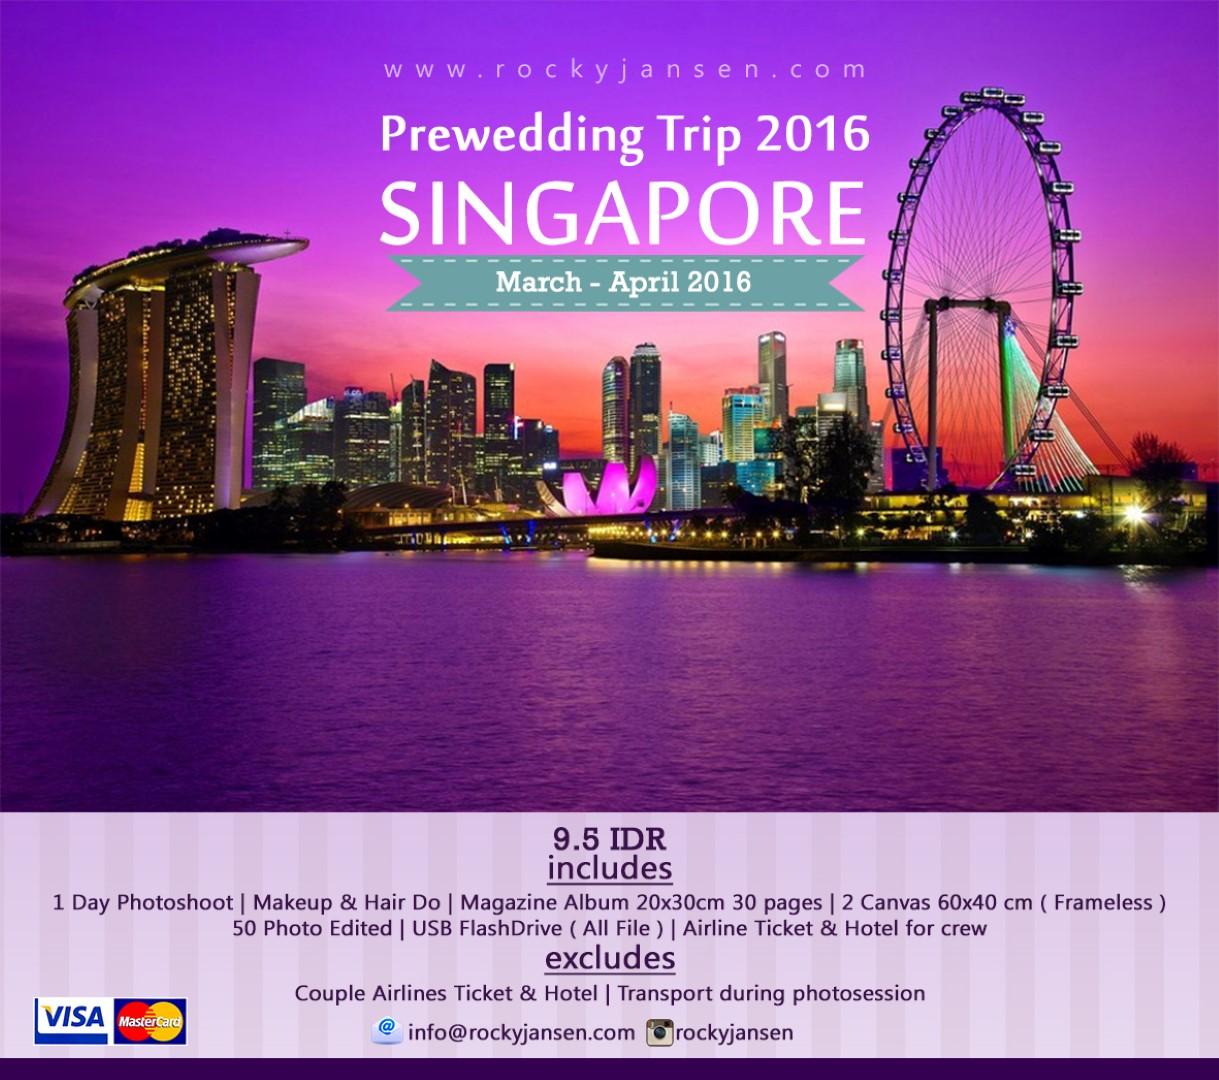 SINGAPORE PREWEDD PACKAGE